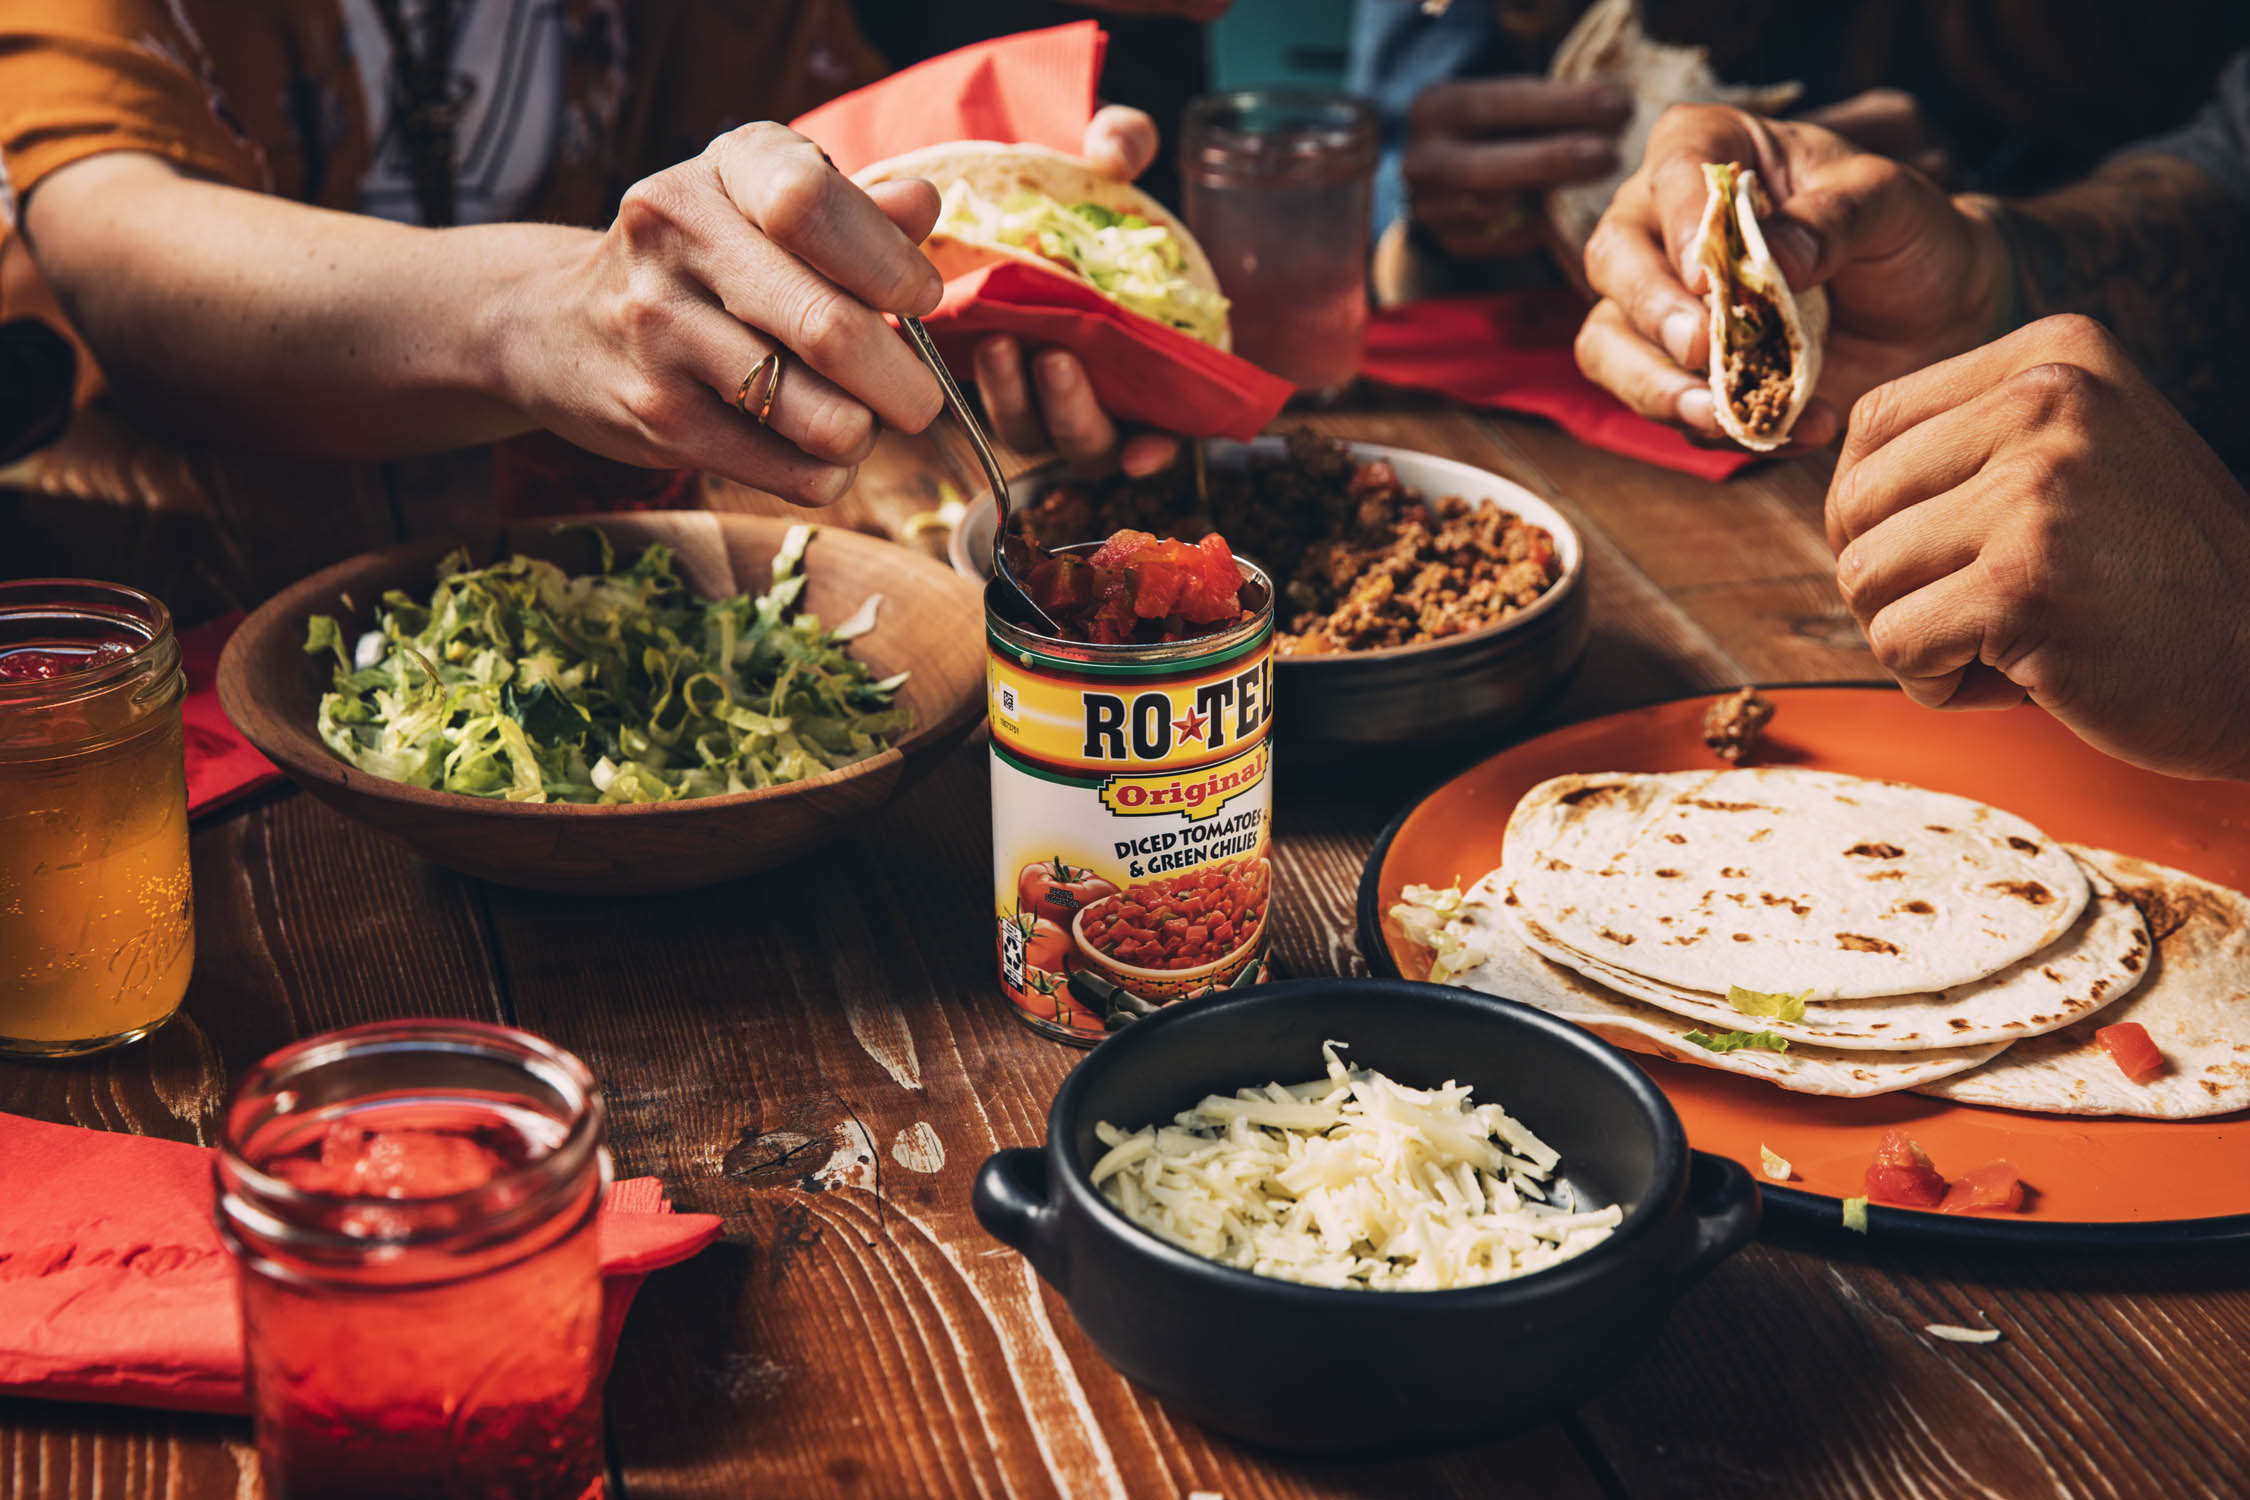 170907_Rotel_Rocking_Tacos_10653.jpg